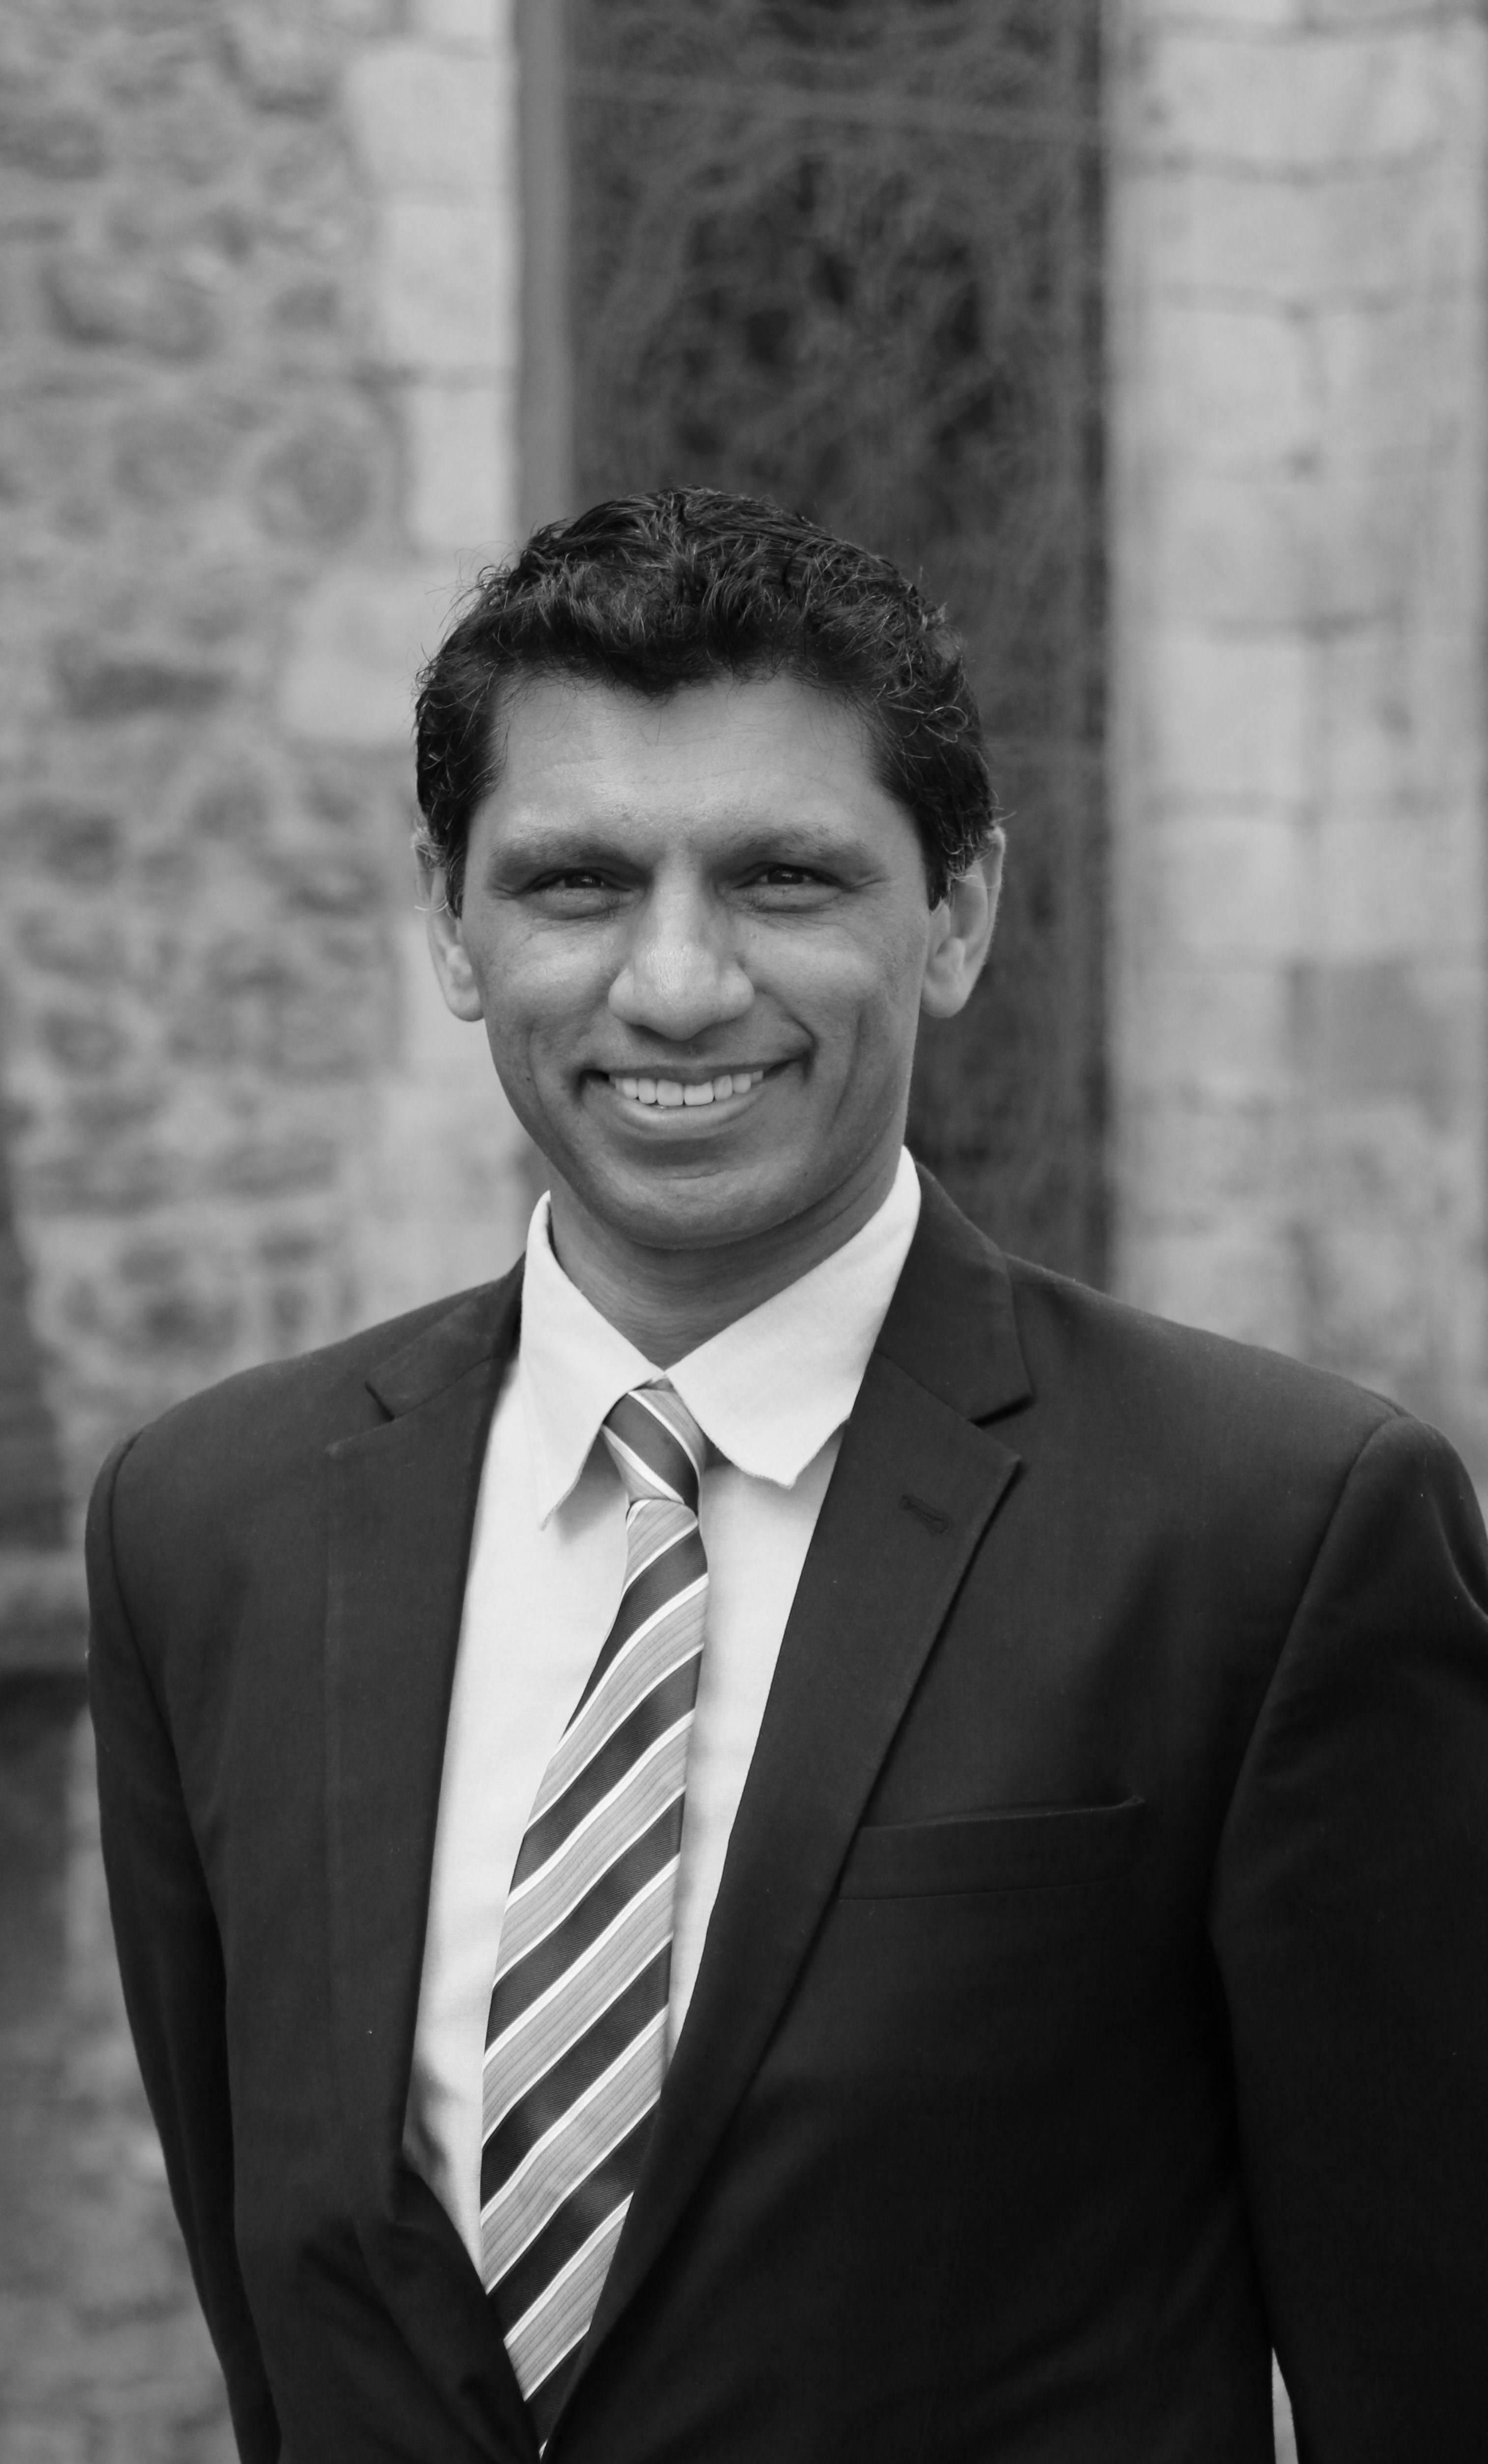 Yasin Patel